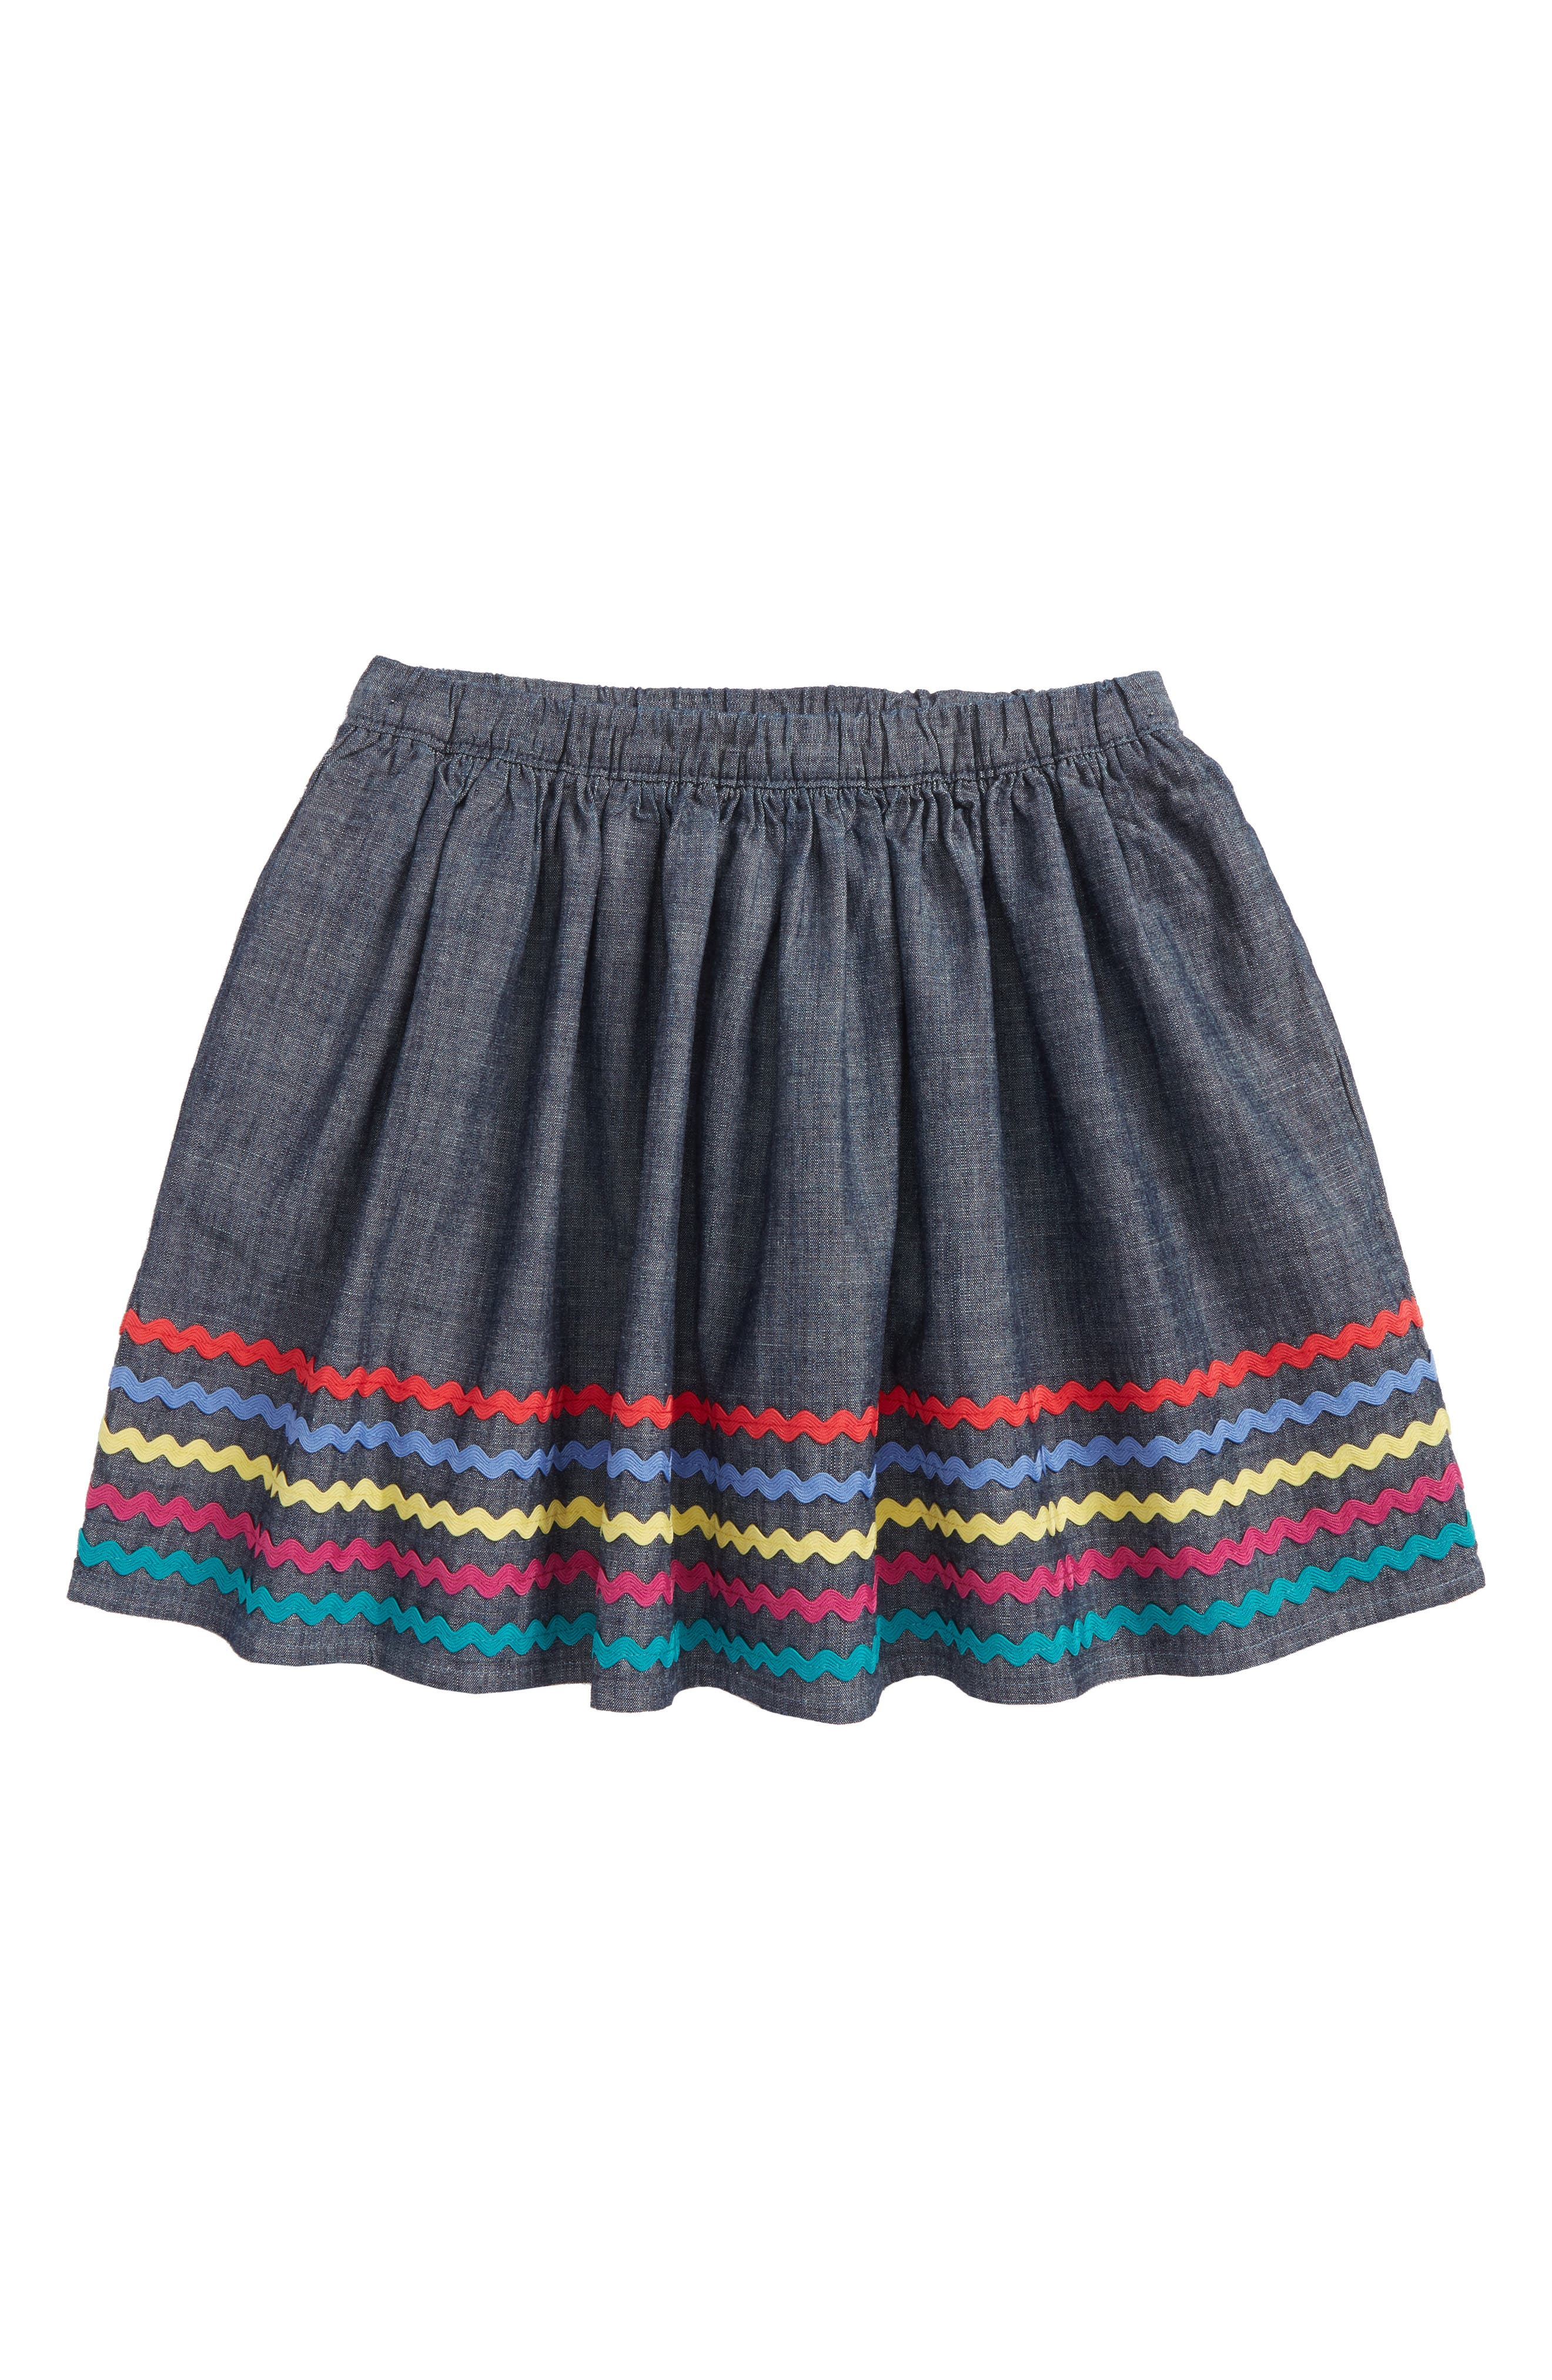 Rickrack Twirl Skirt,                         Main,                         color, 410